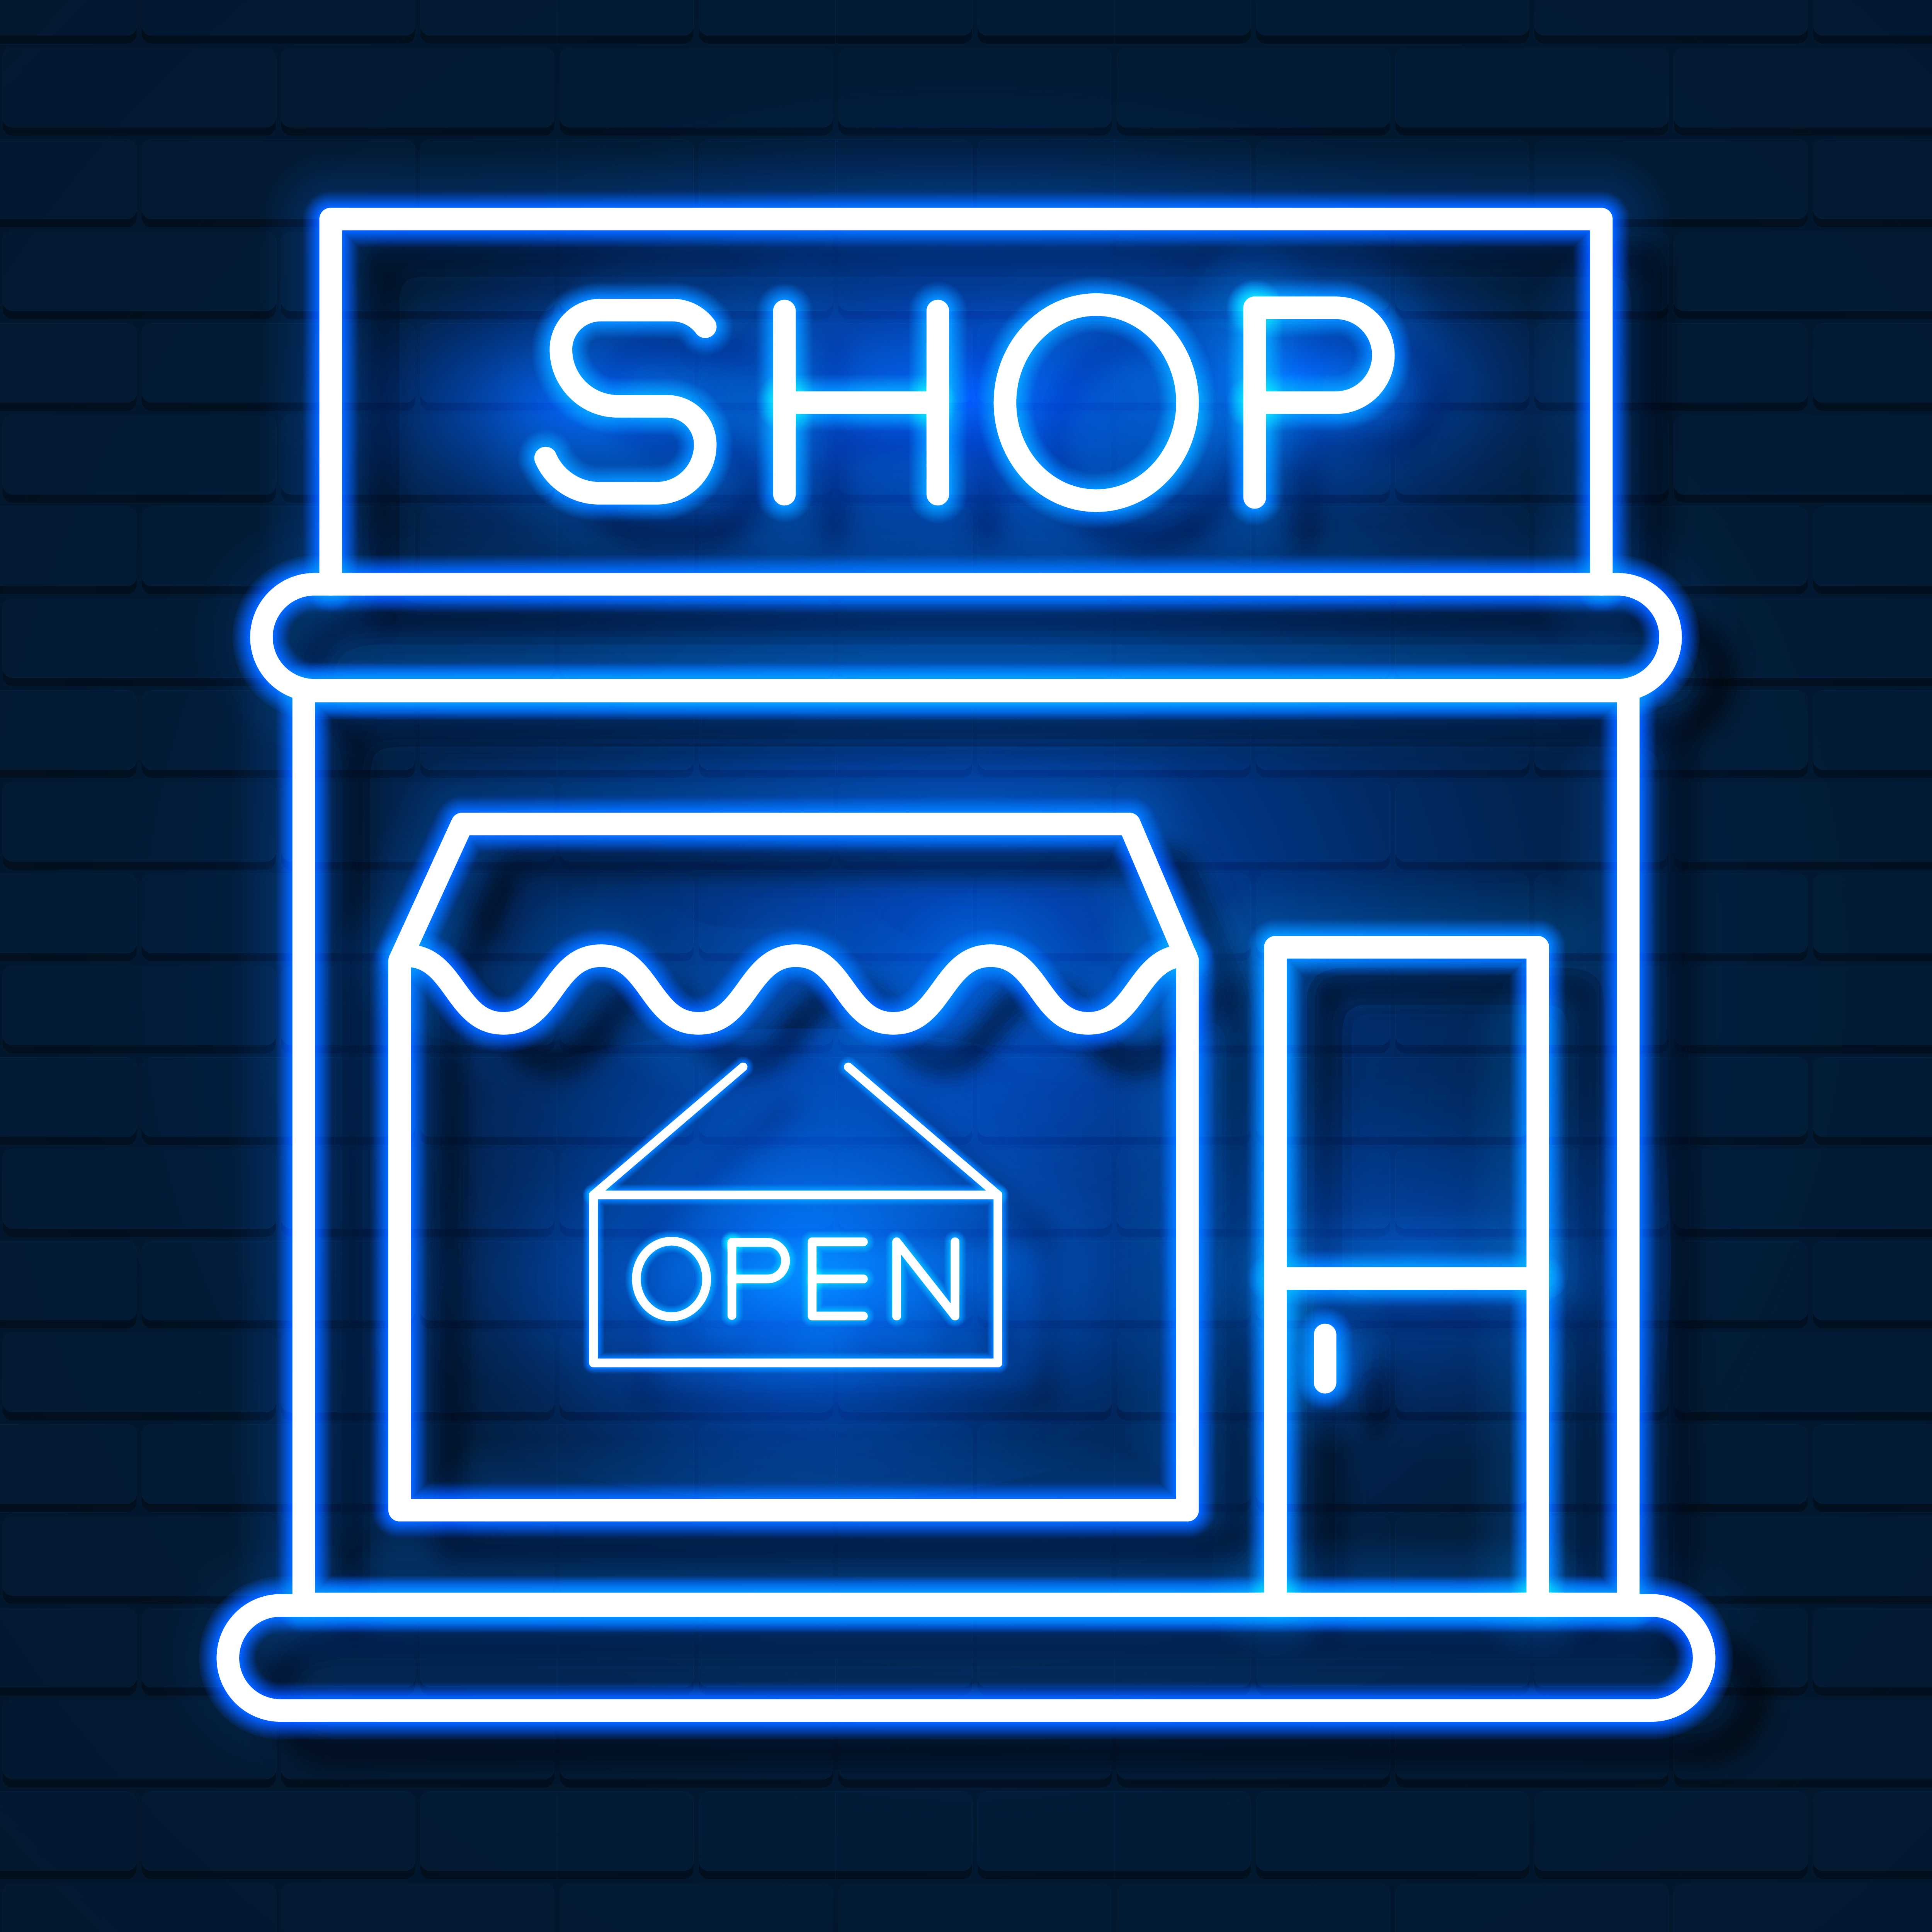 Shop now banner design Royalty Free Vector Image